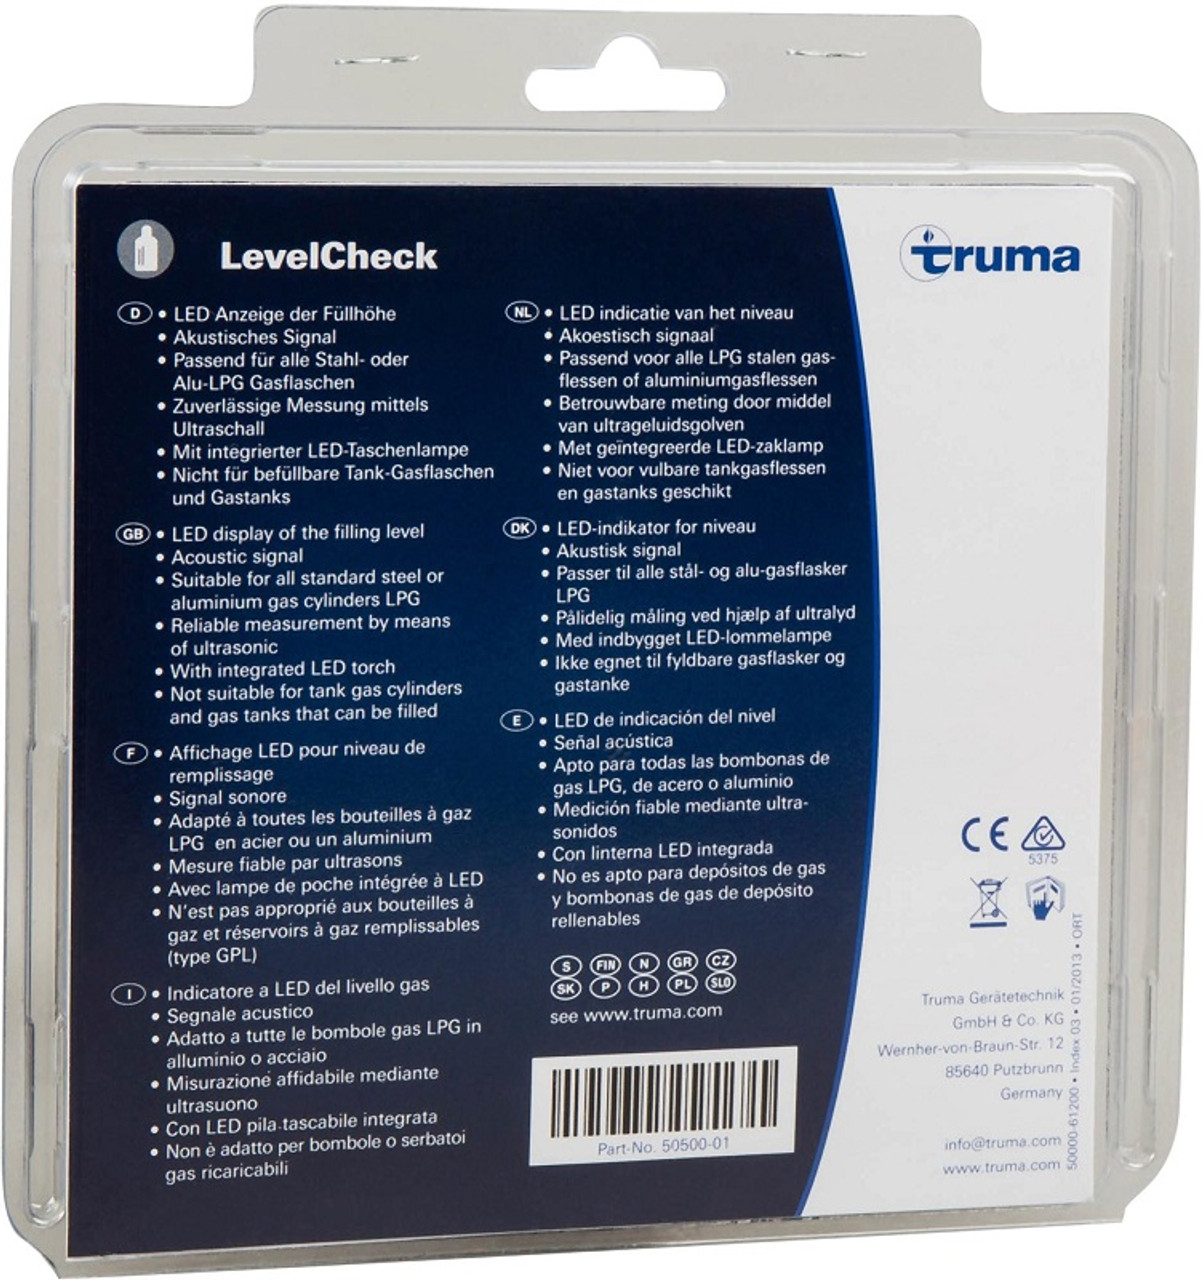 Truma gas monitor checks low gas level.